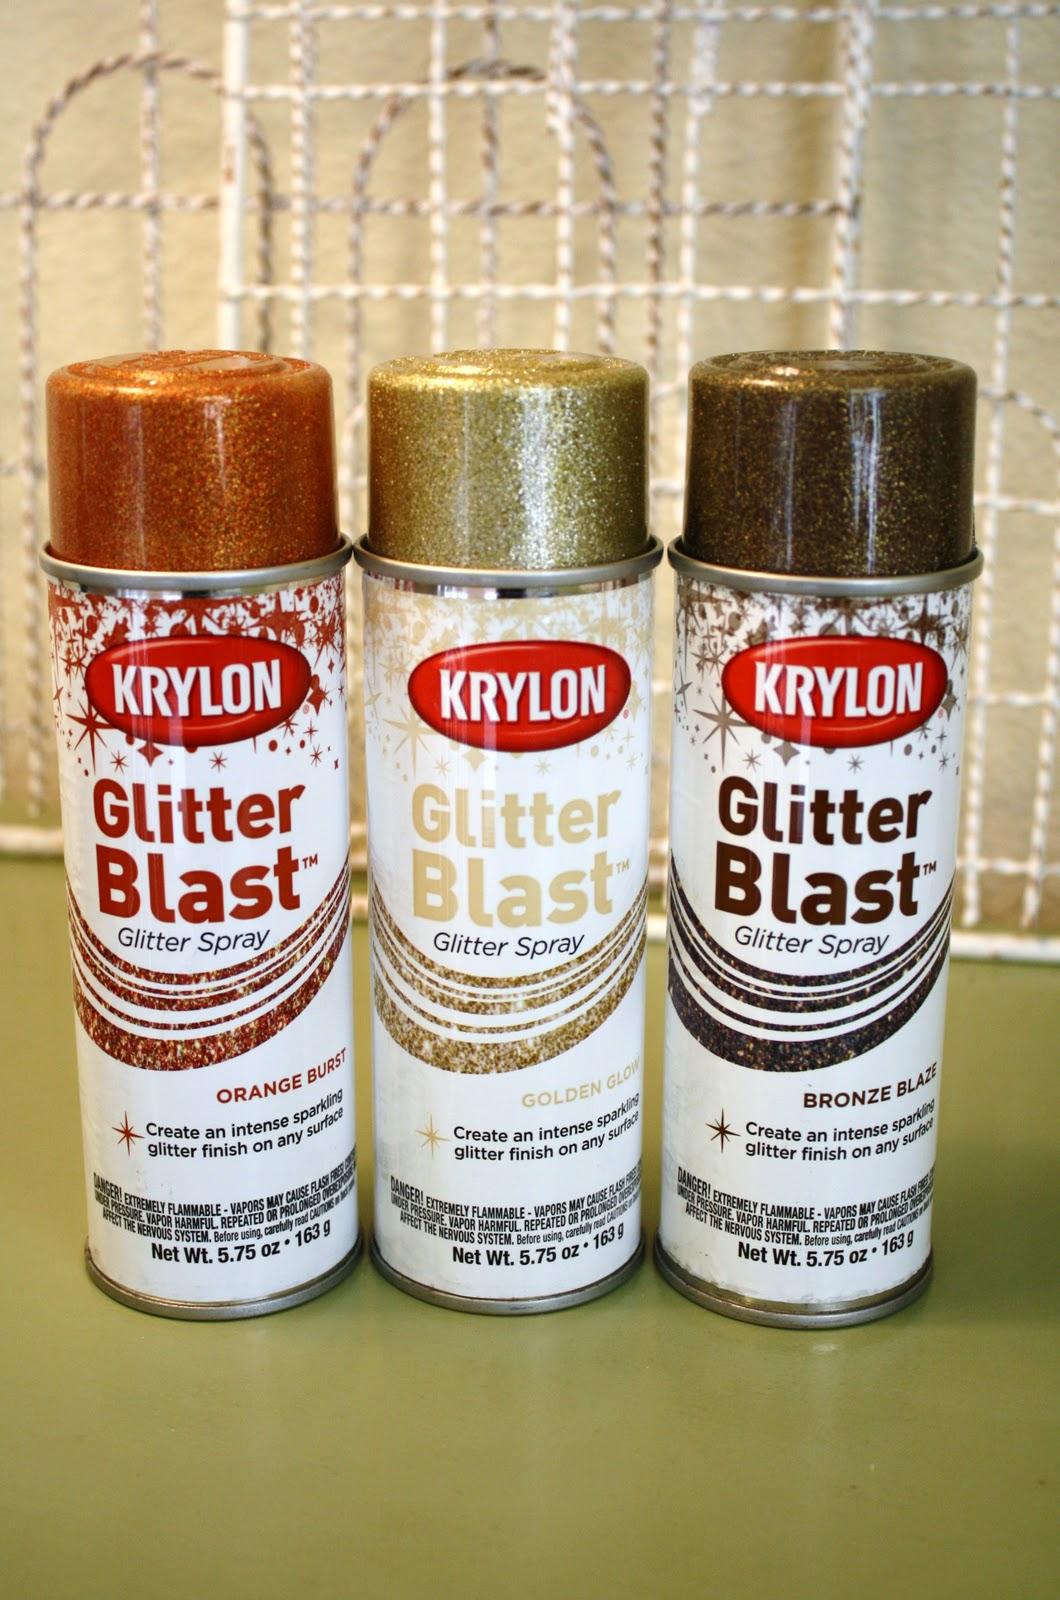 Glitter dryer vent pumpkins for Spray glitter for crafts